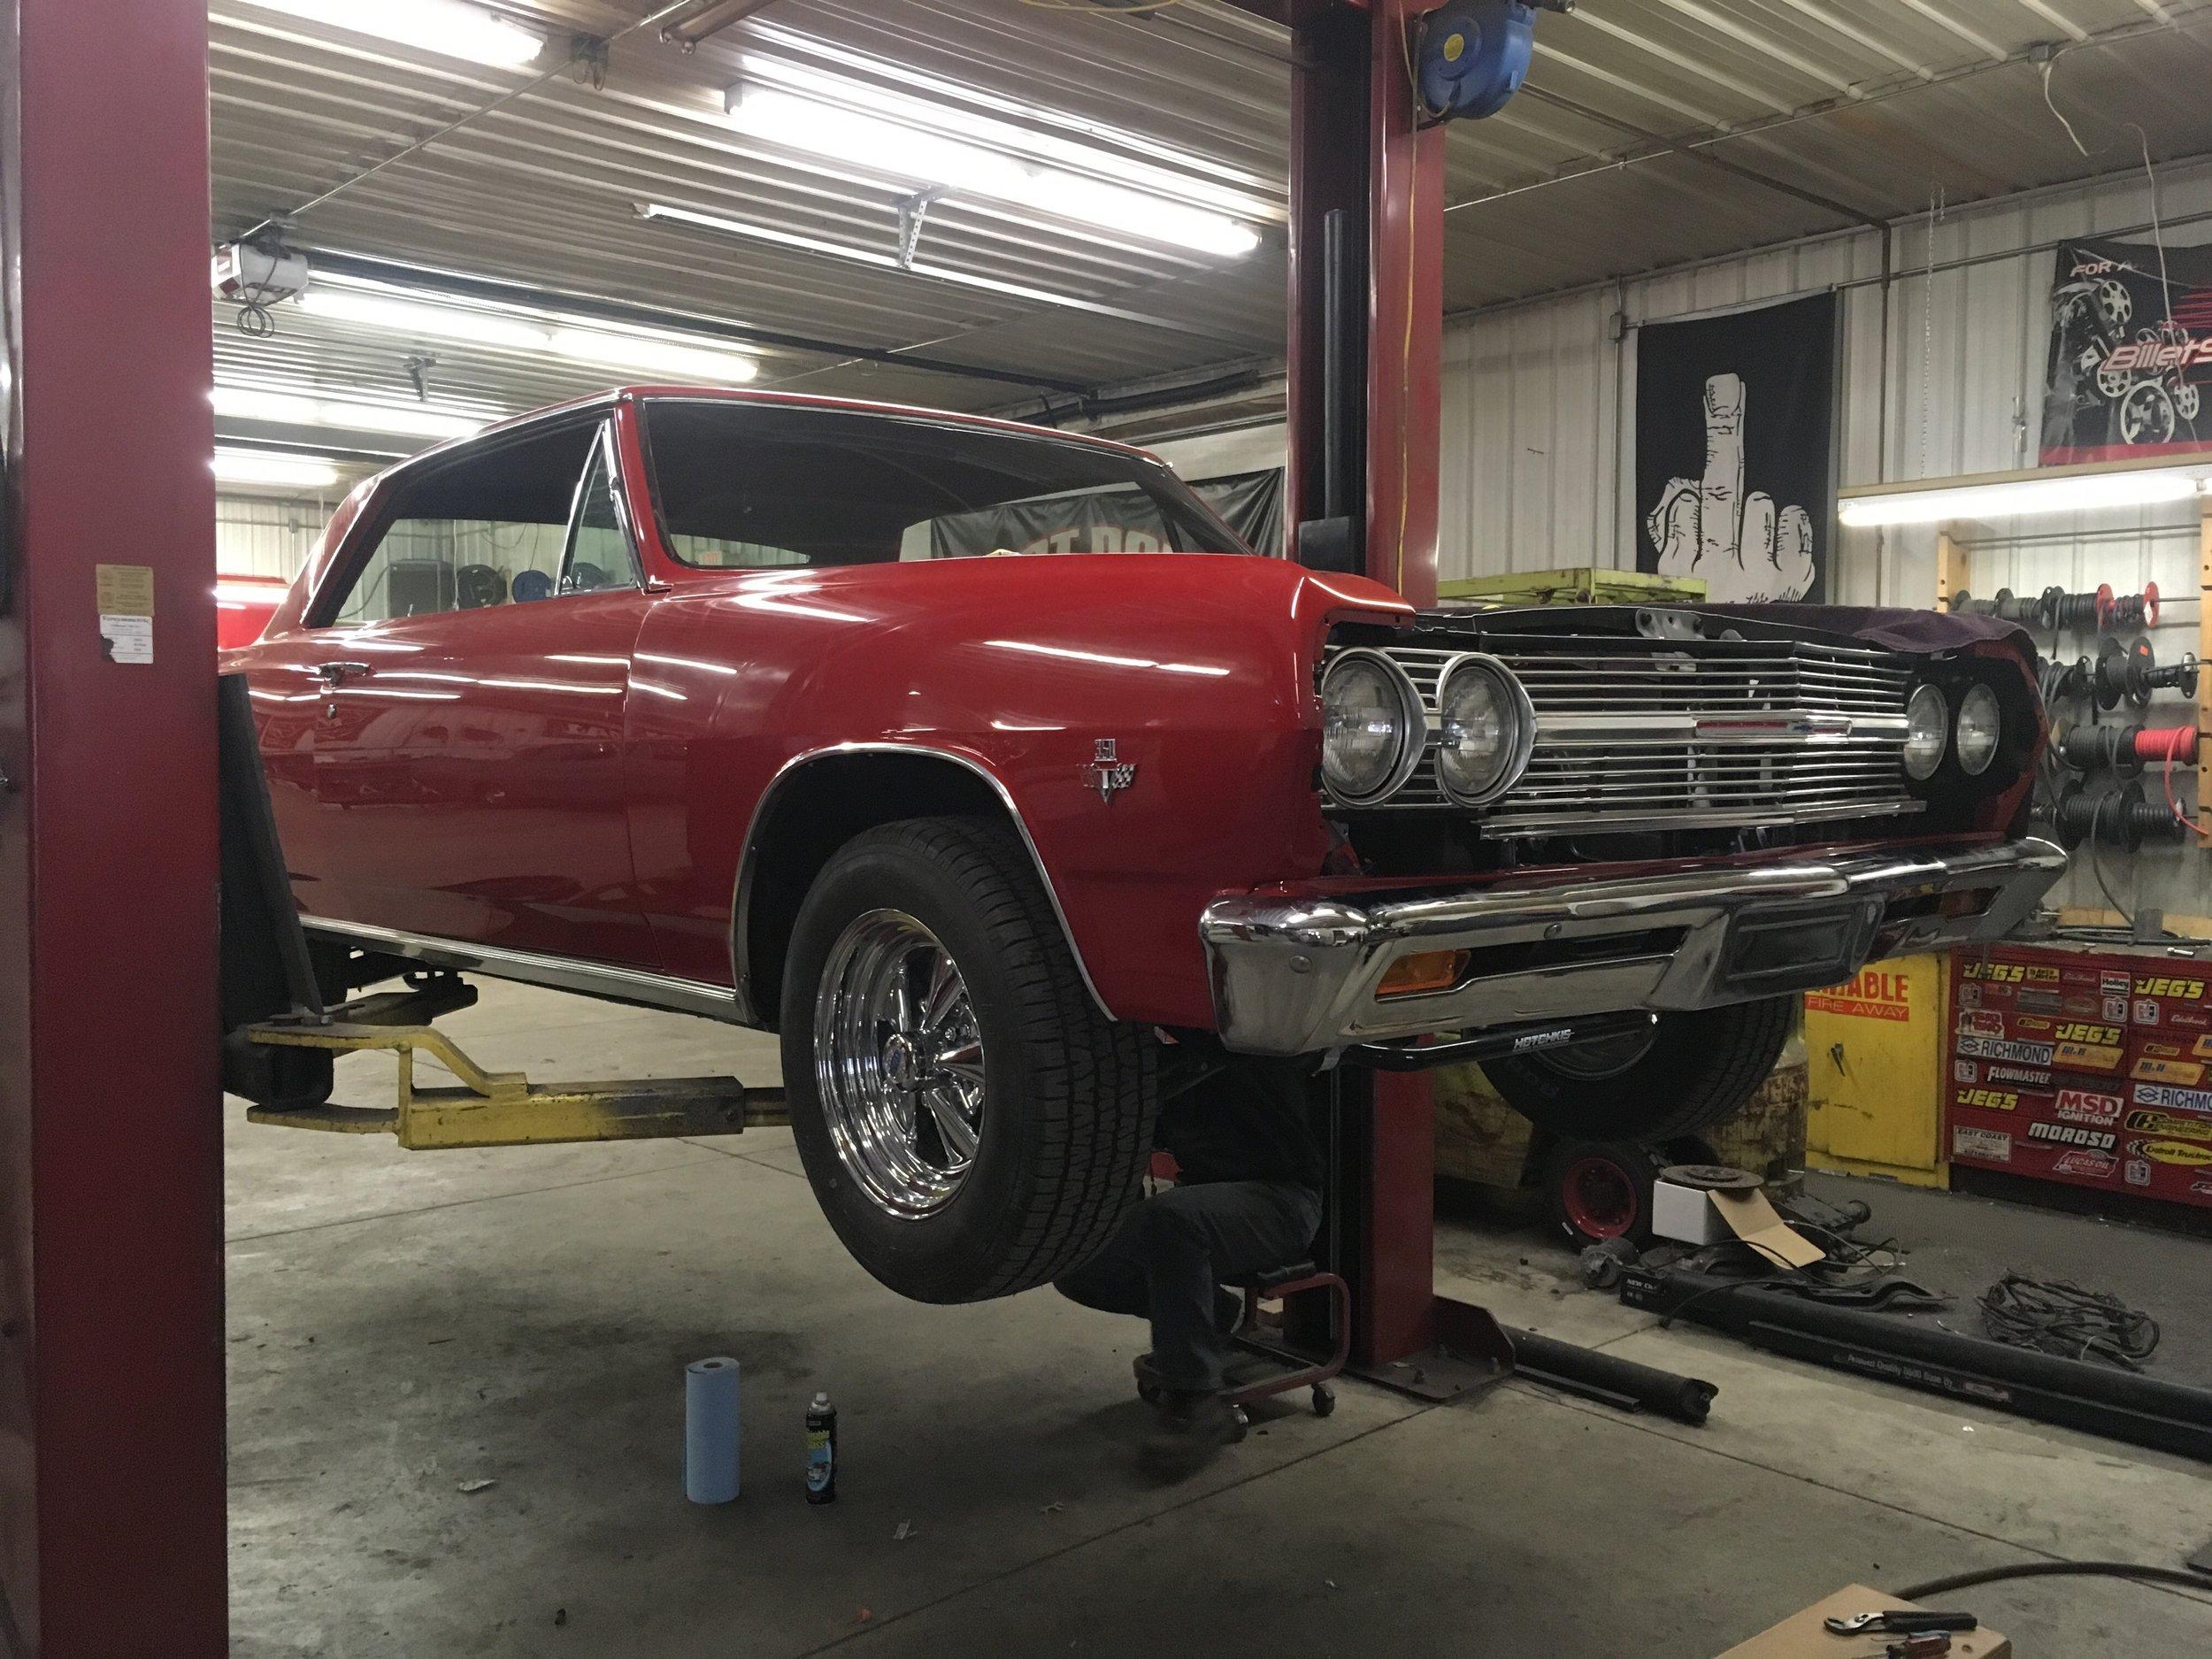 65-chevelle-minneapolis-custom-hot-rod-car-restoration.jpg